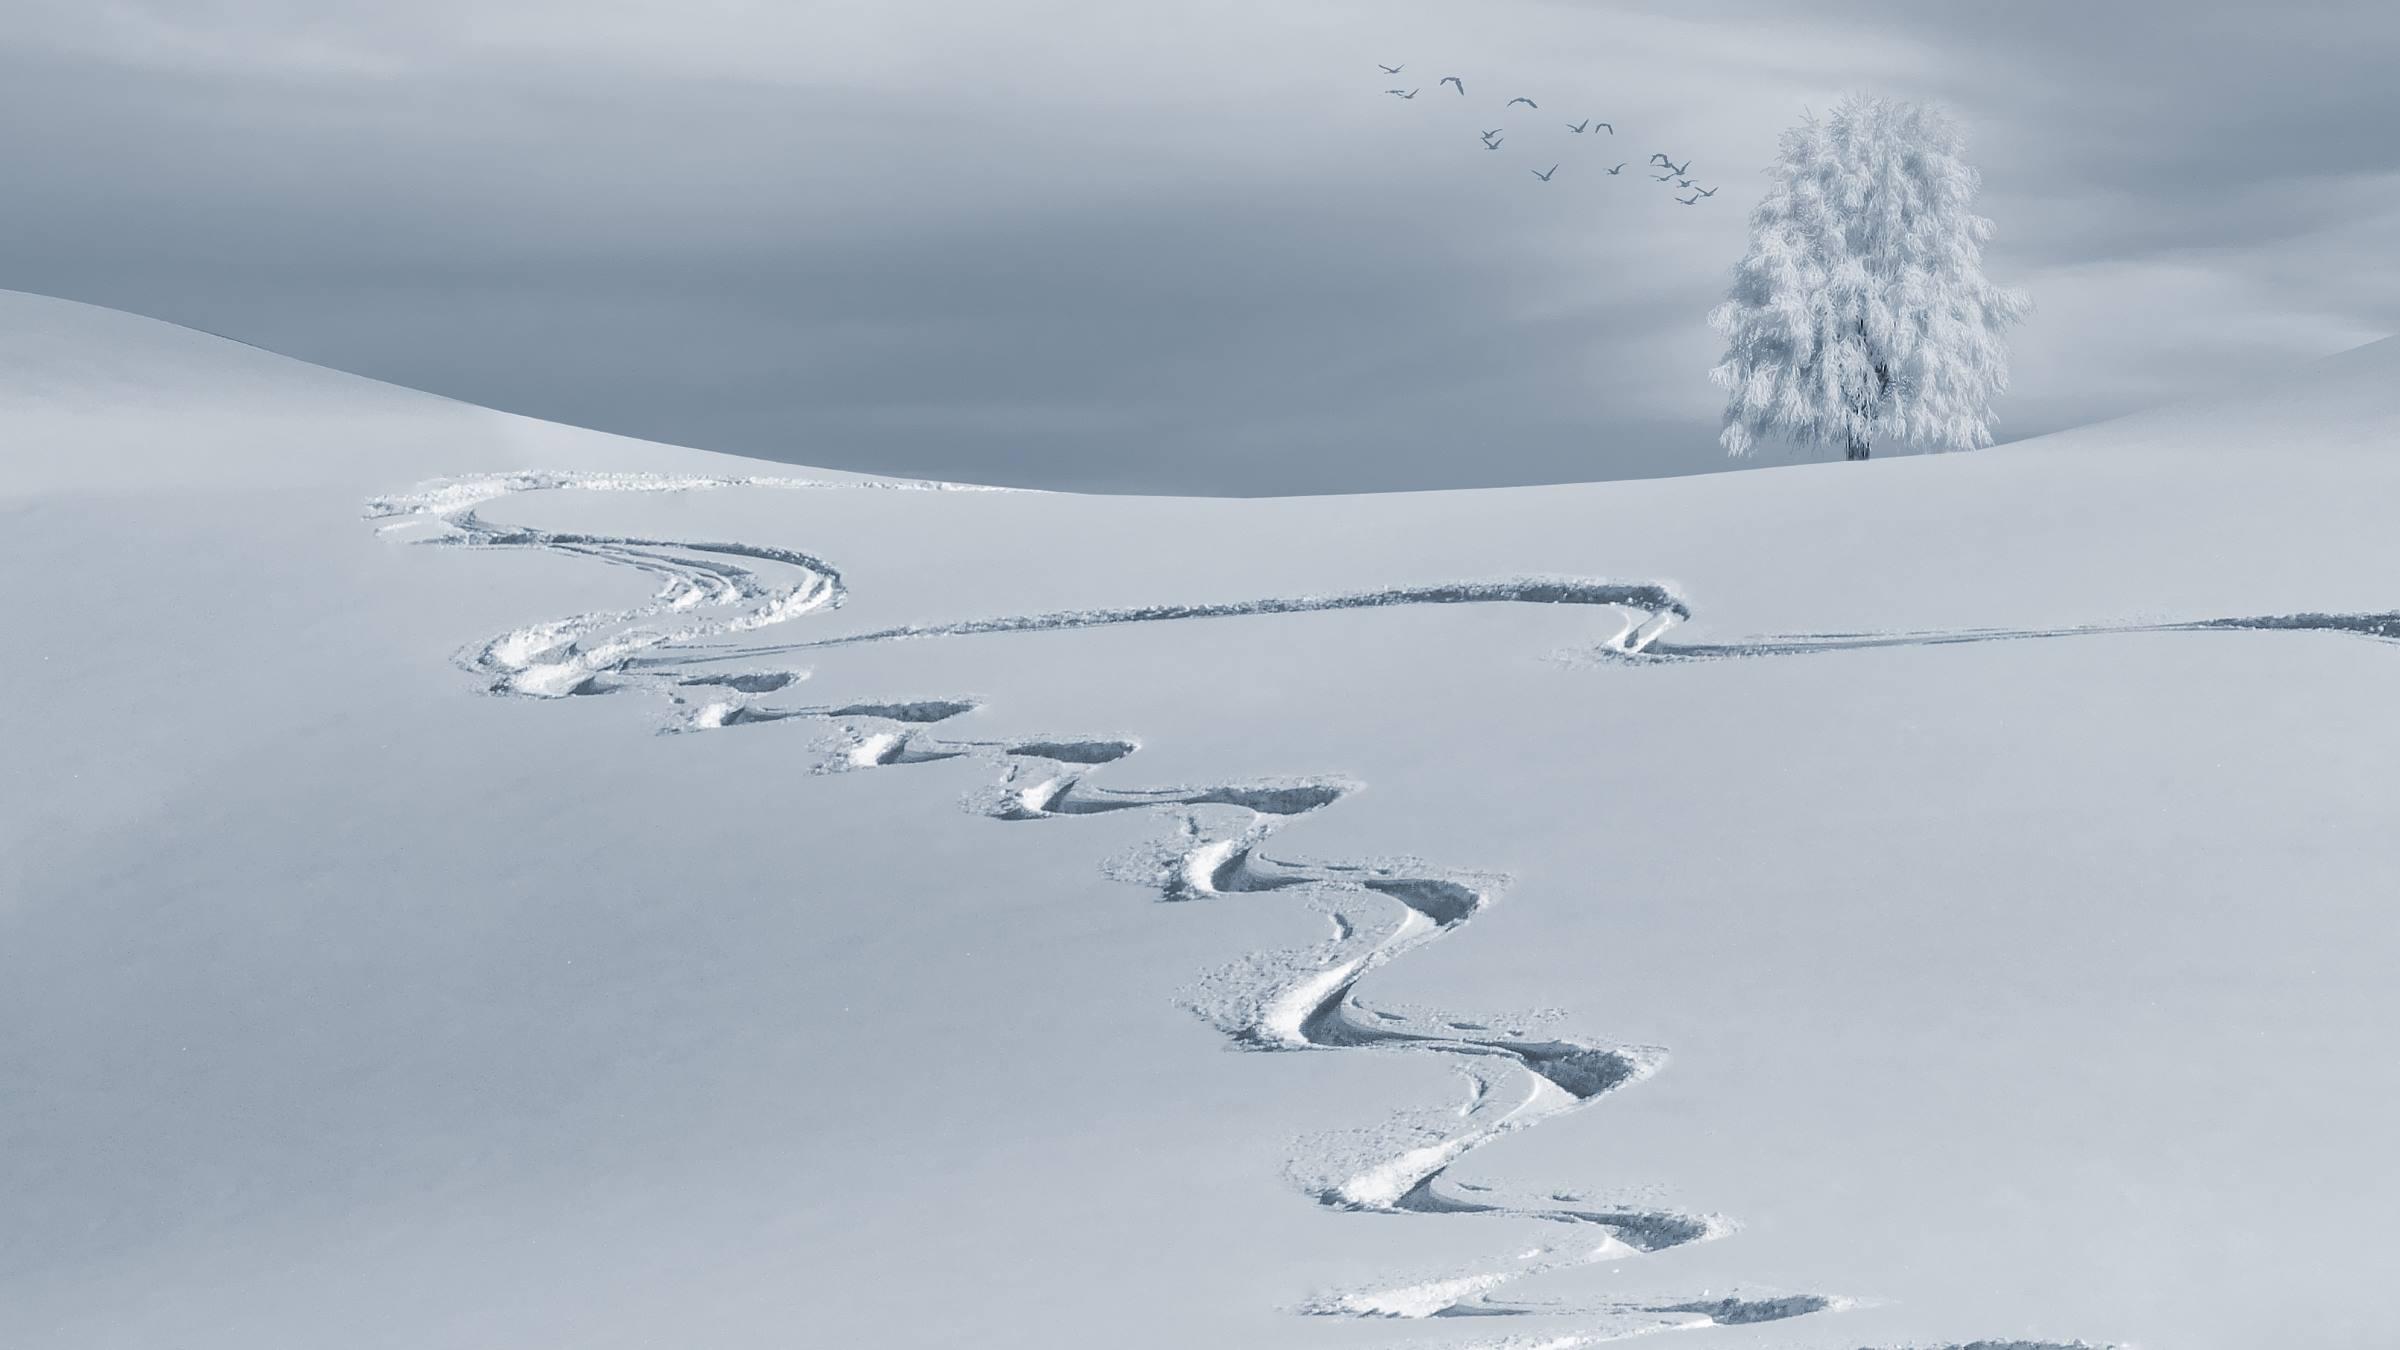 winter snow ski tracks tree